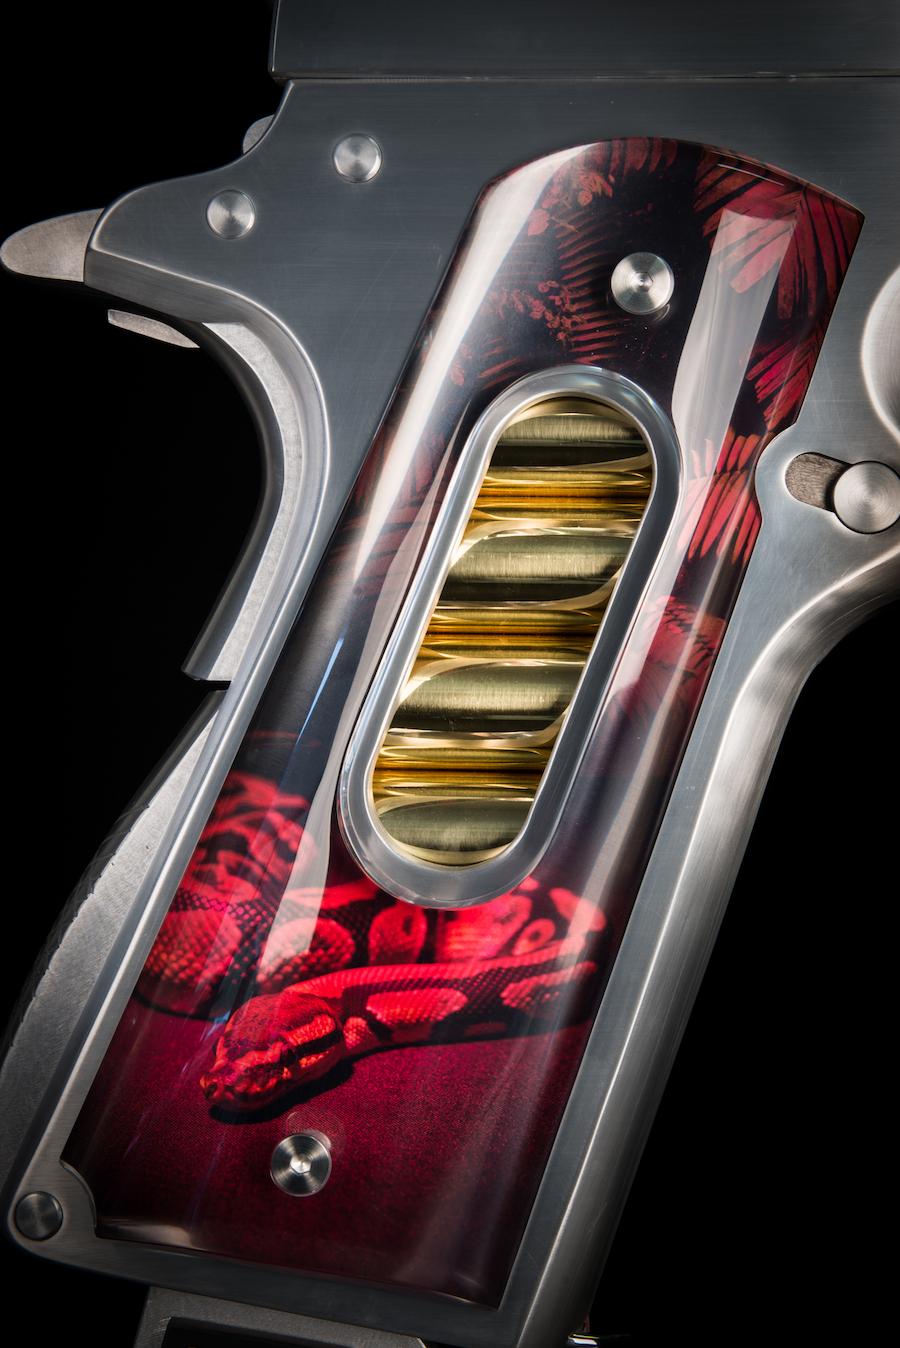 jean-octobon-cutaway-gun-culpture